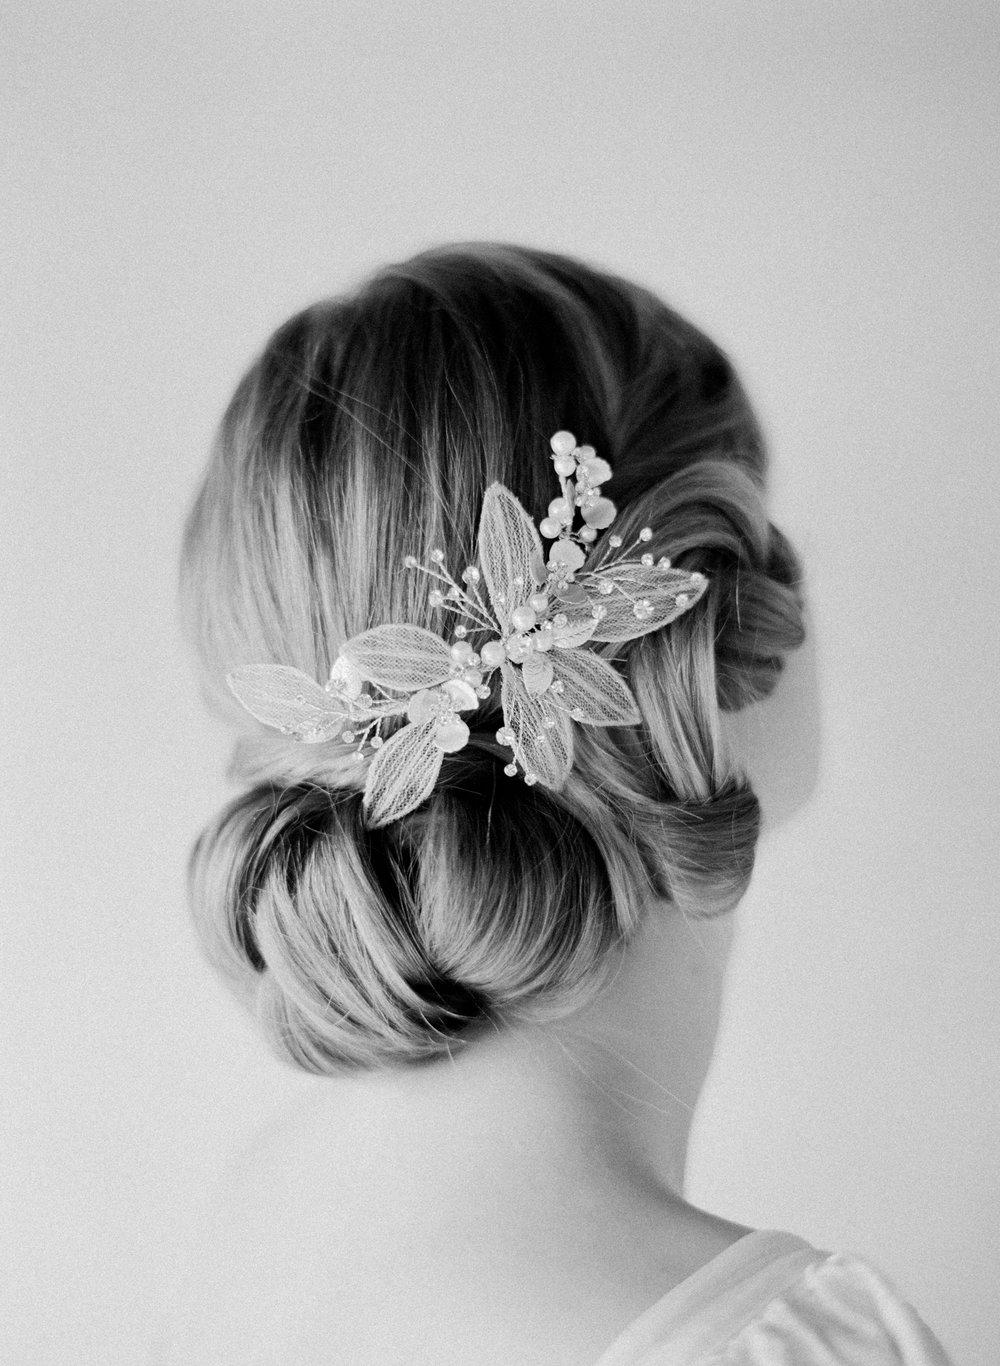 Classic-Bridal-Portraits-205-Jen_Huang-BHLDN-Winter-Bride-213-Jen_Huang-000086570001.jpg